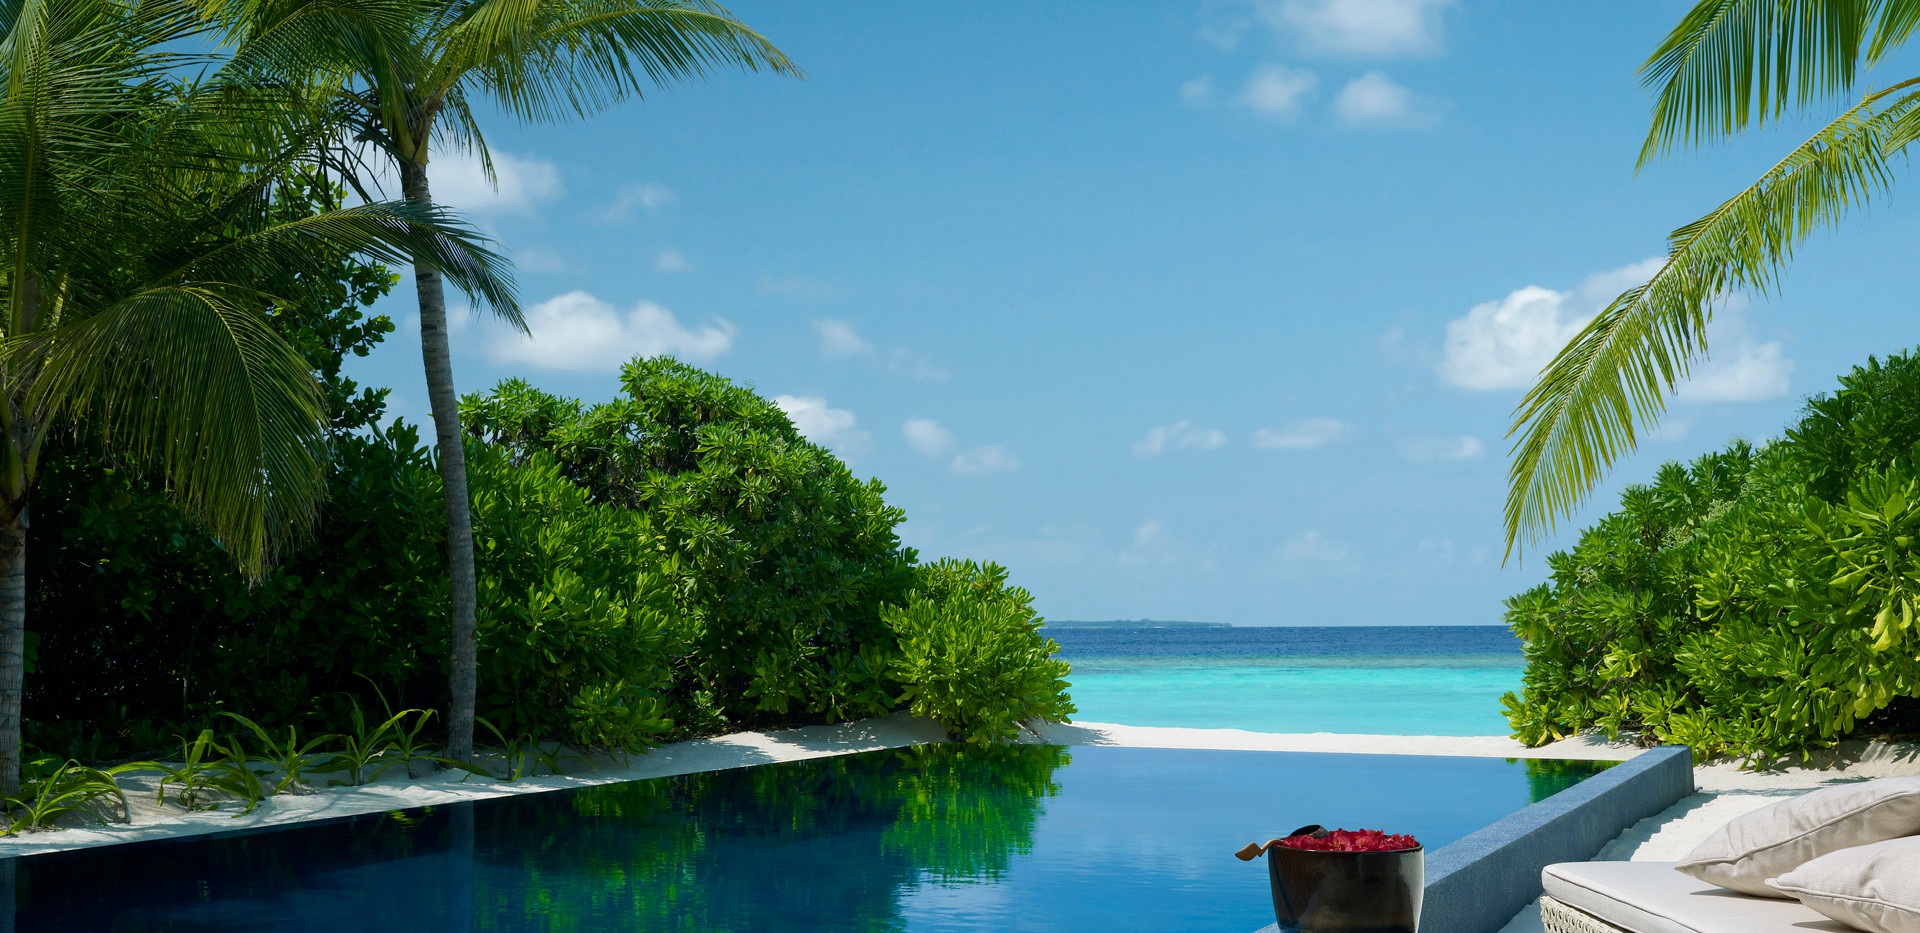 DTMD_Beach residence pool 02.jpg